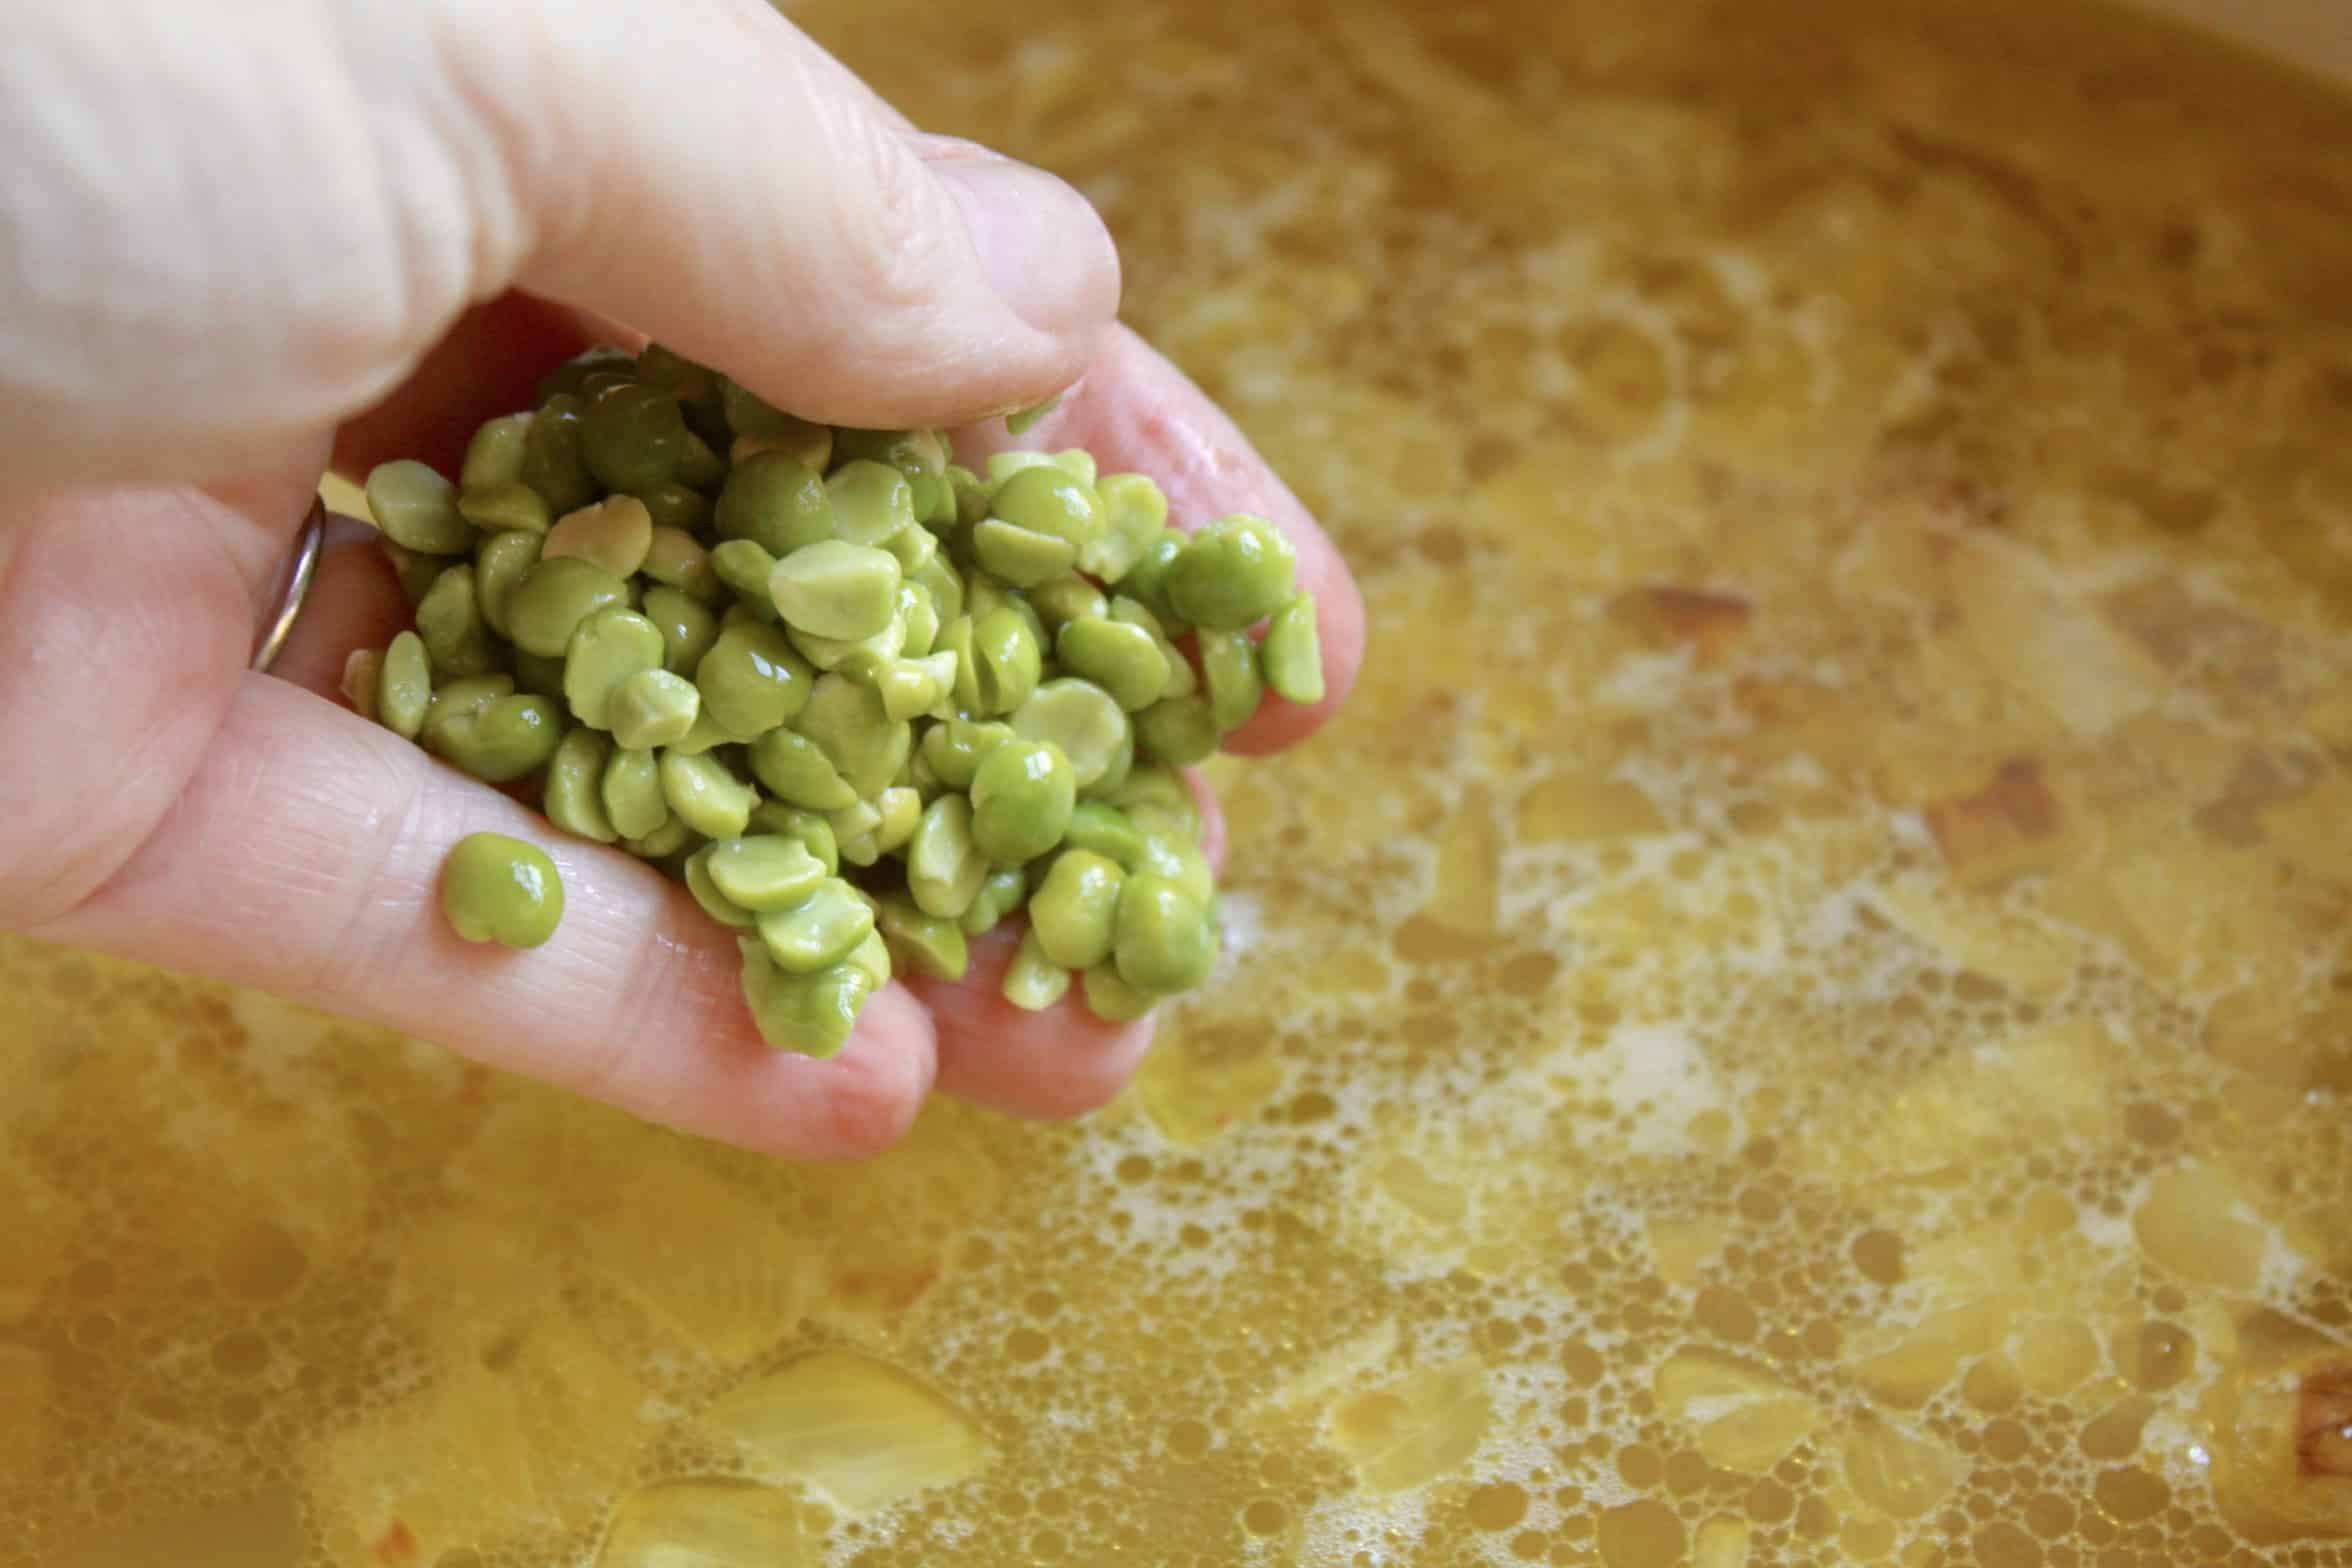 adding the split peas